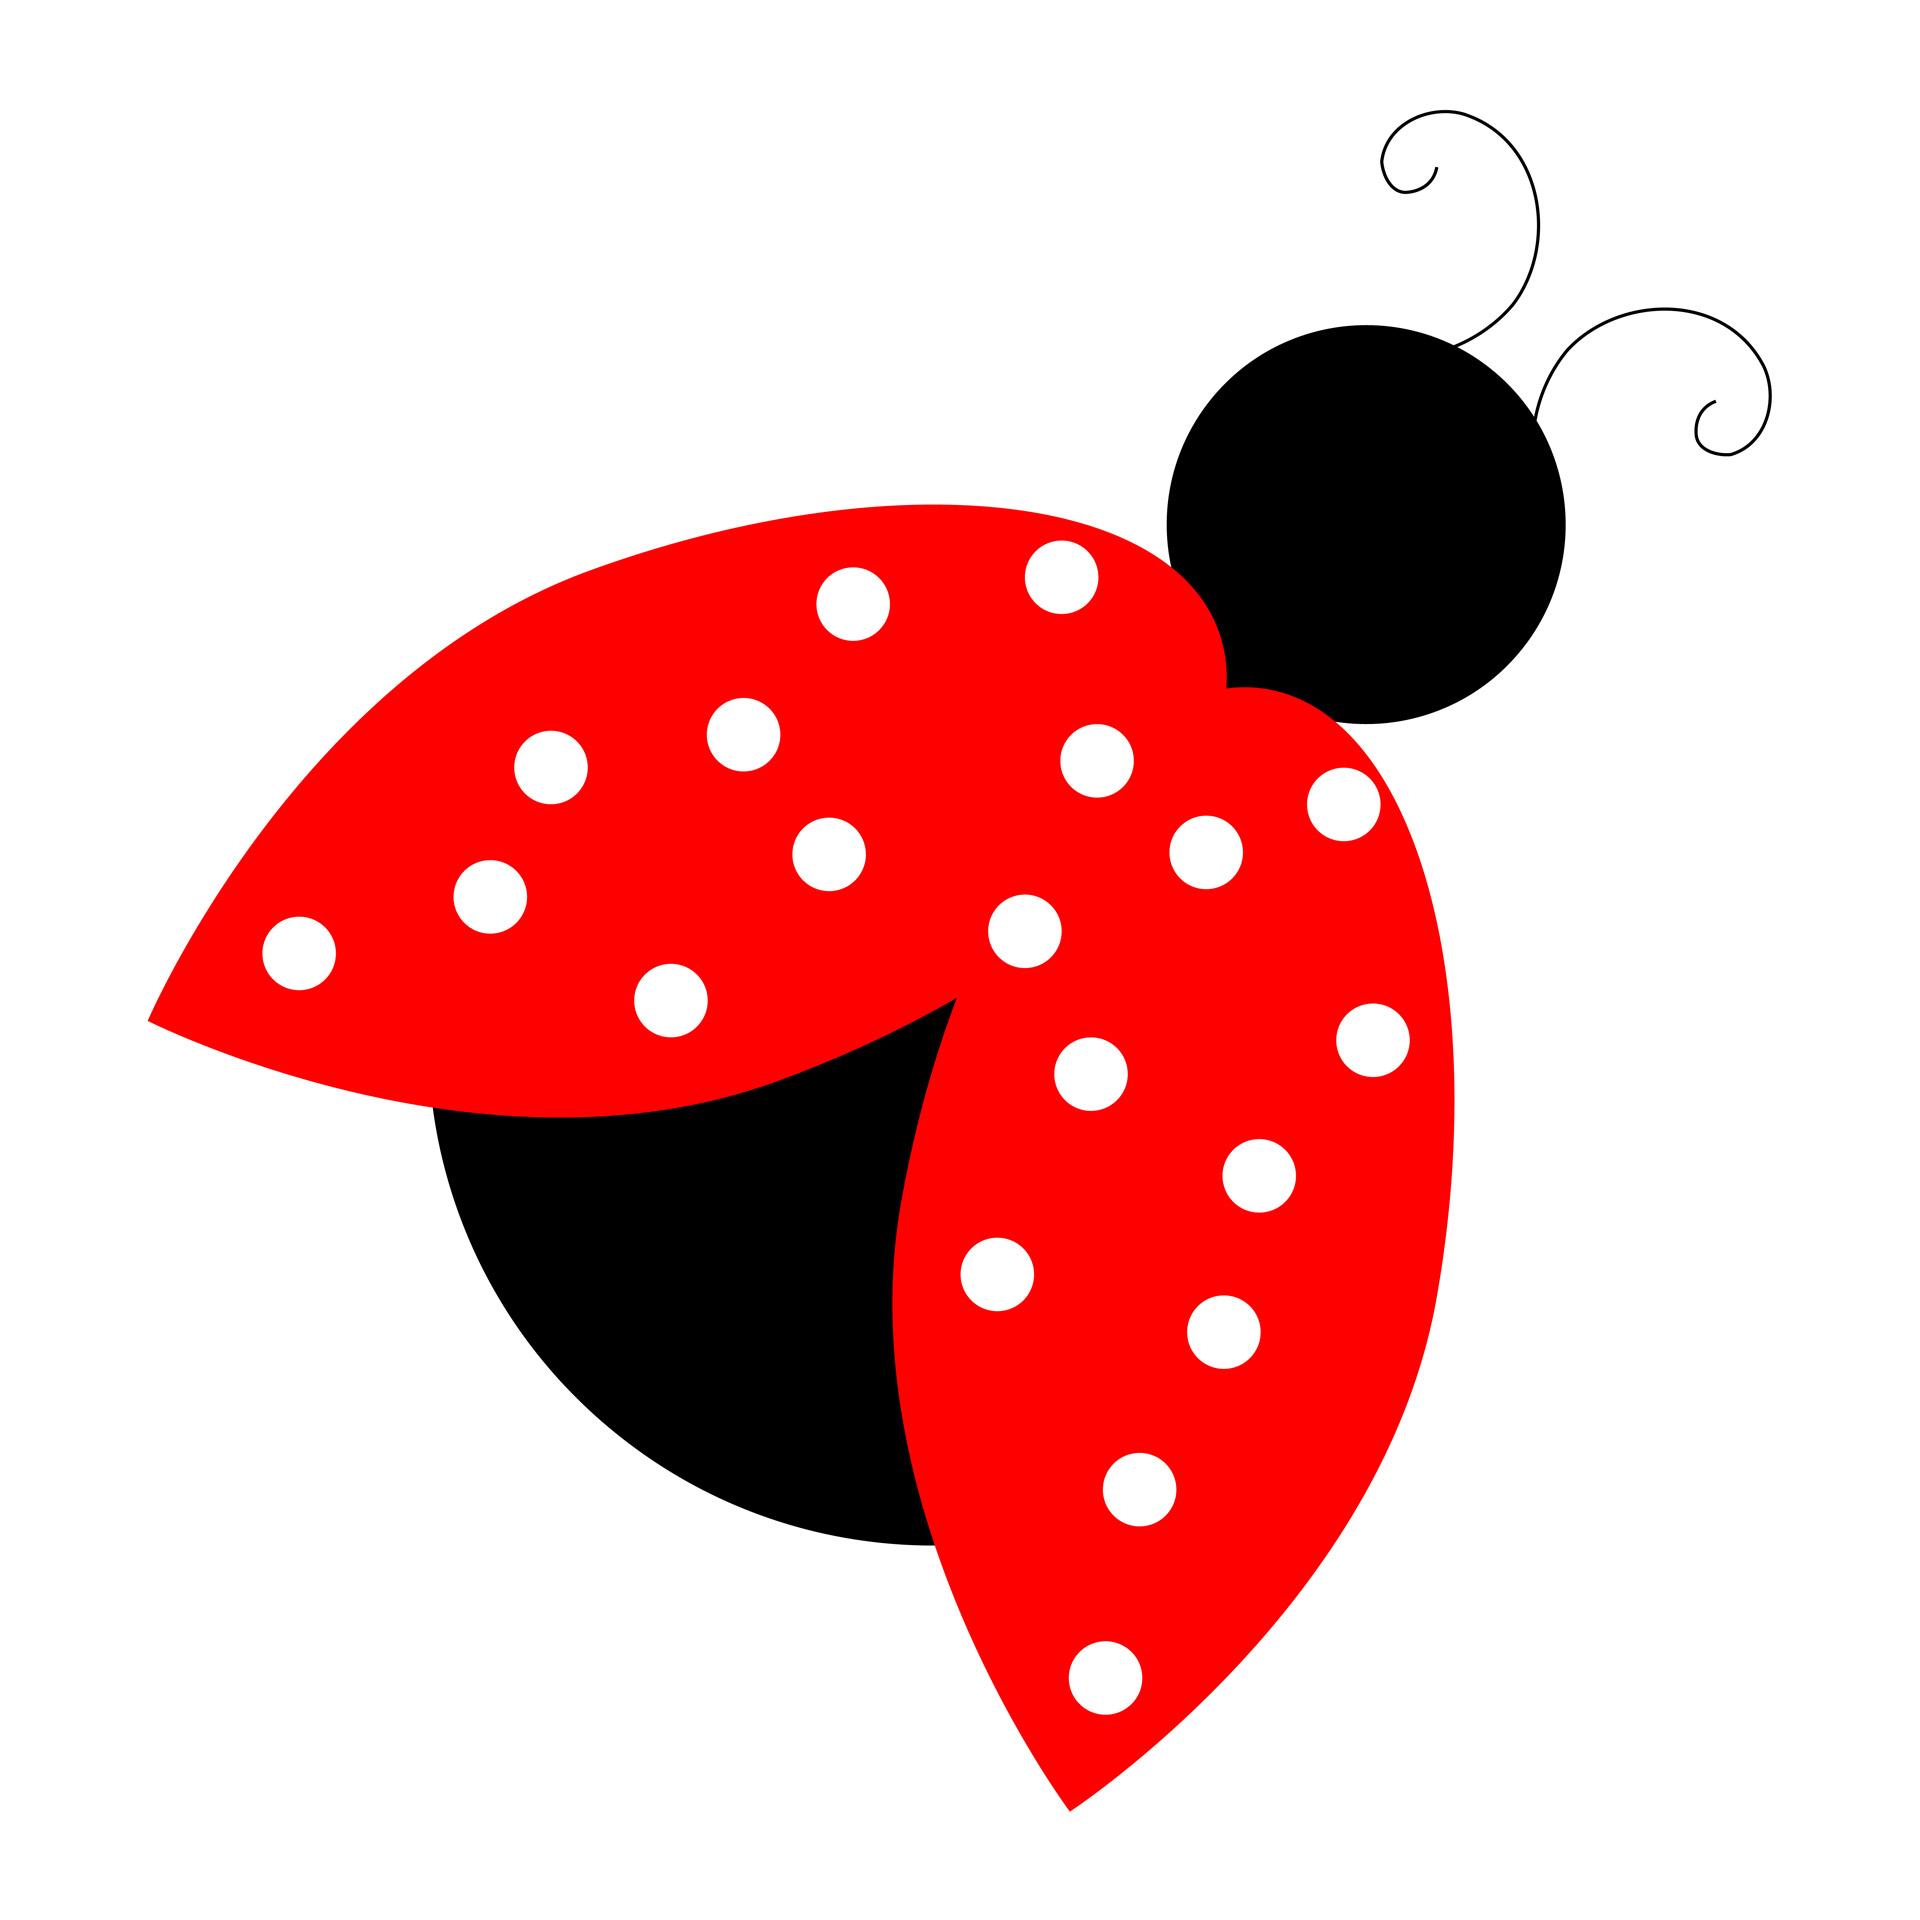 Red Ladybug Clipart-Red Ladybug Clipart-14